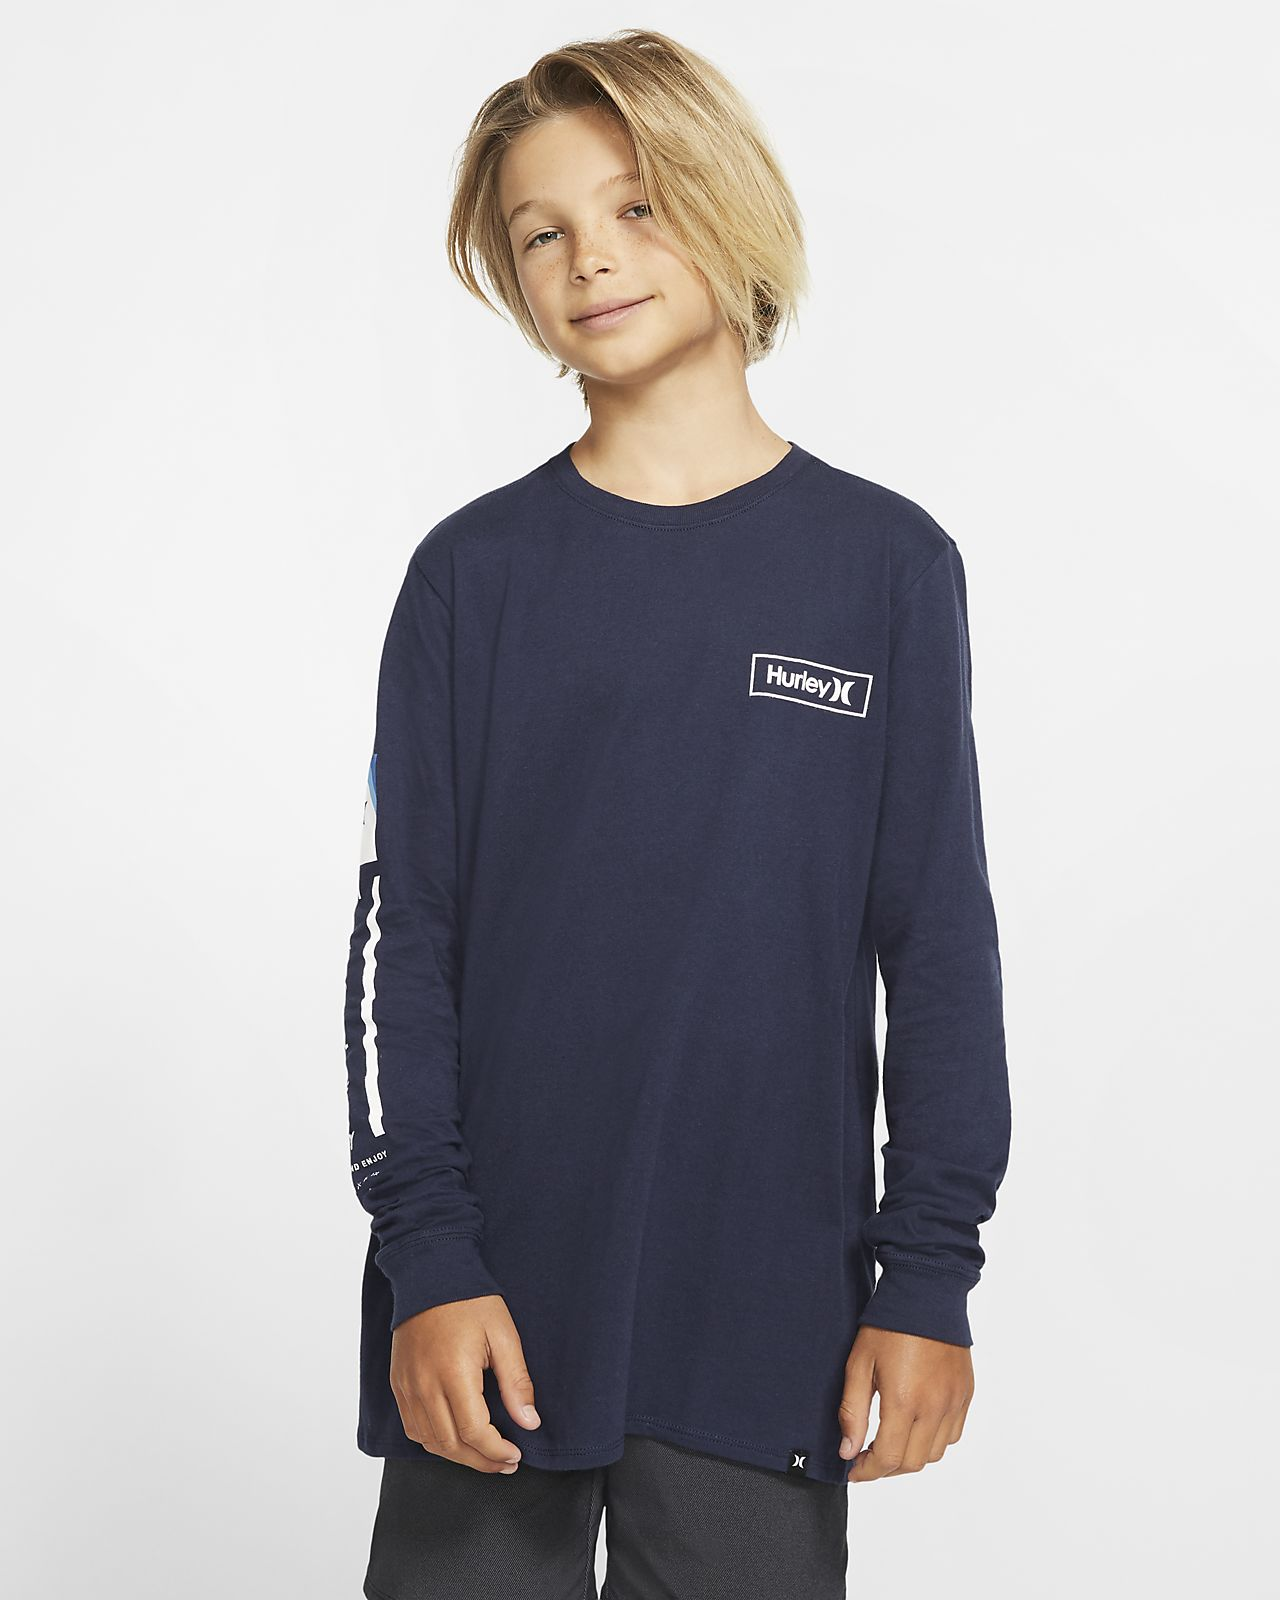 Hurley Premium Right Arm Boys' Premium Fit Long-Sleeve T-Shirt